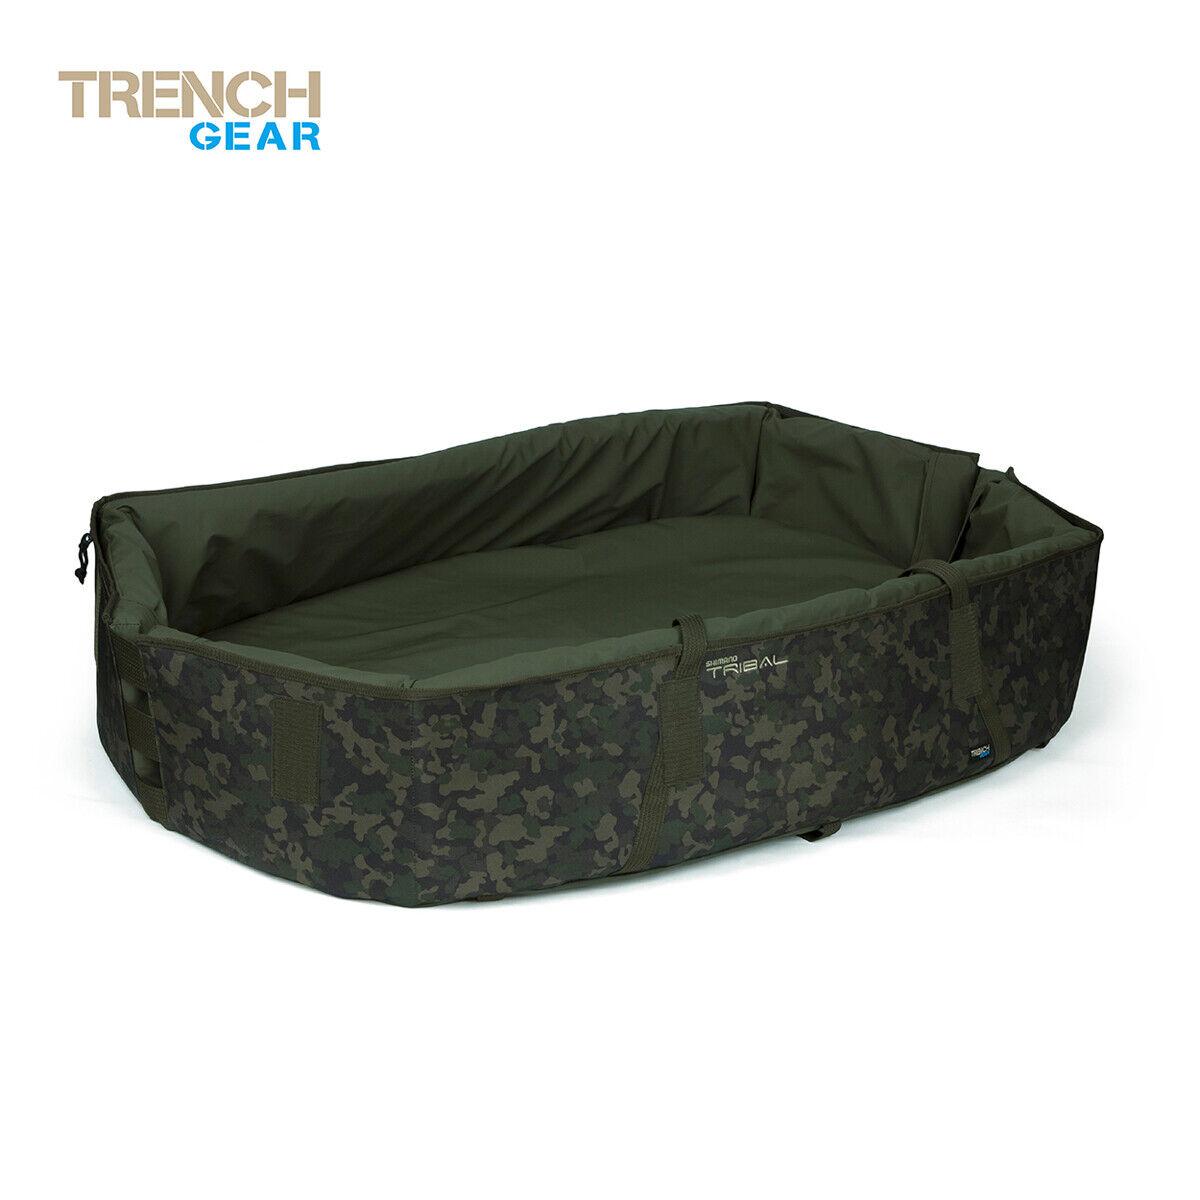 Shimano tribal Trench Euro protection mat mat carp carp